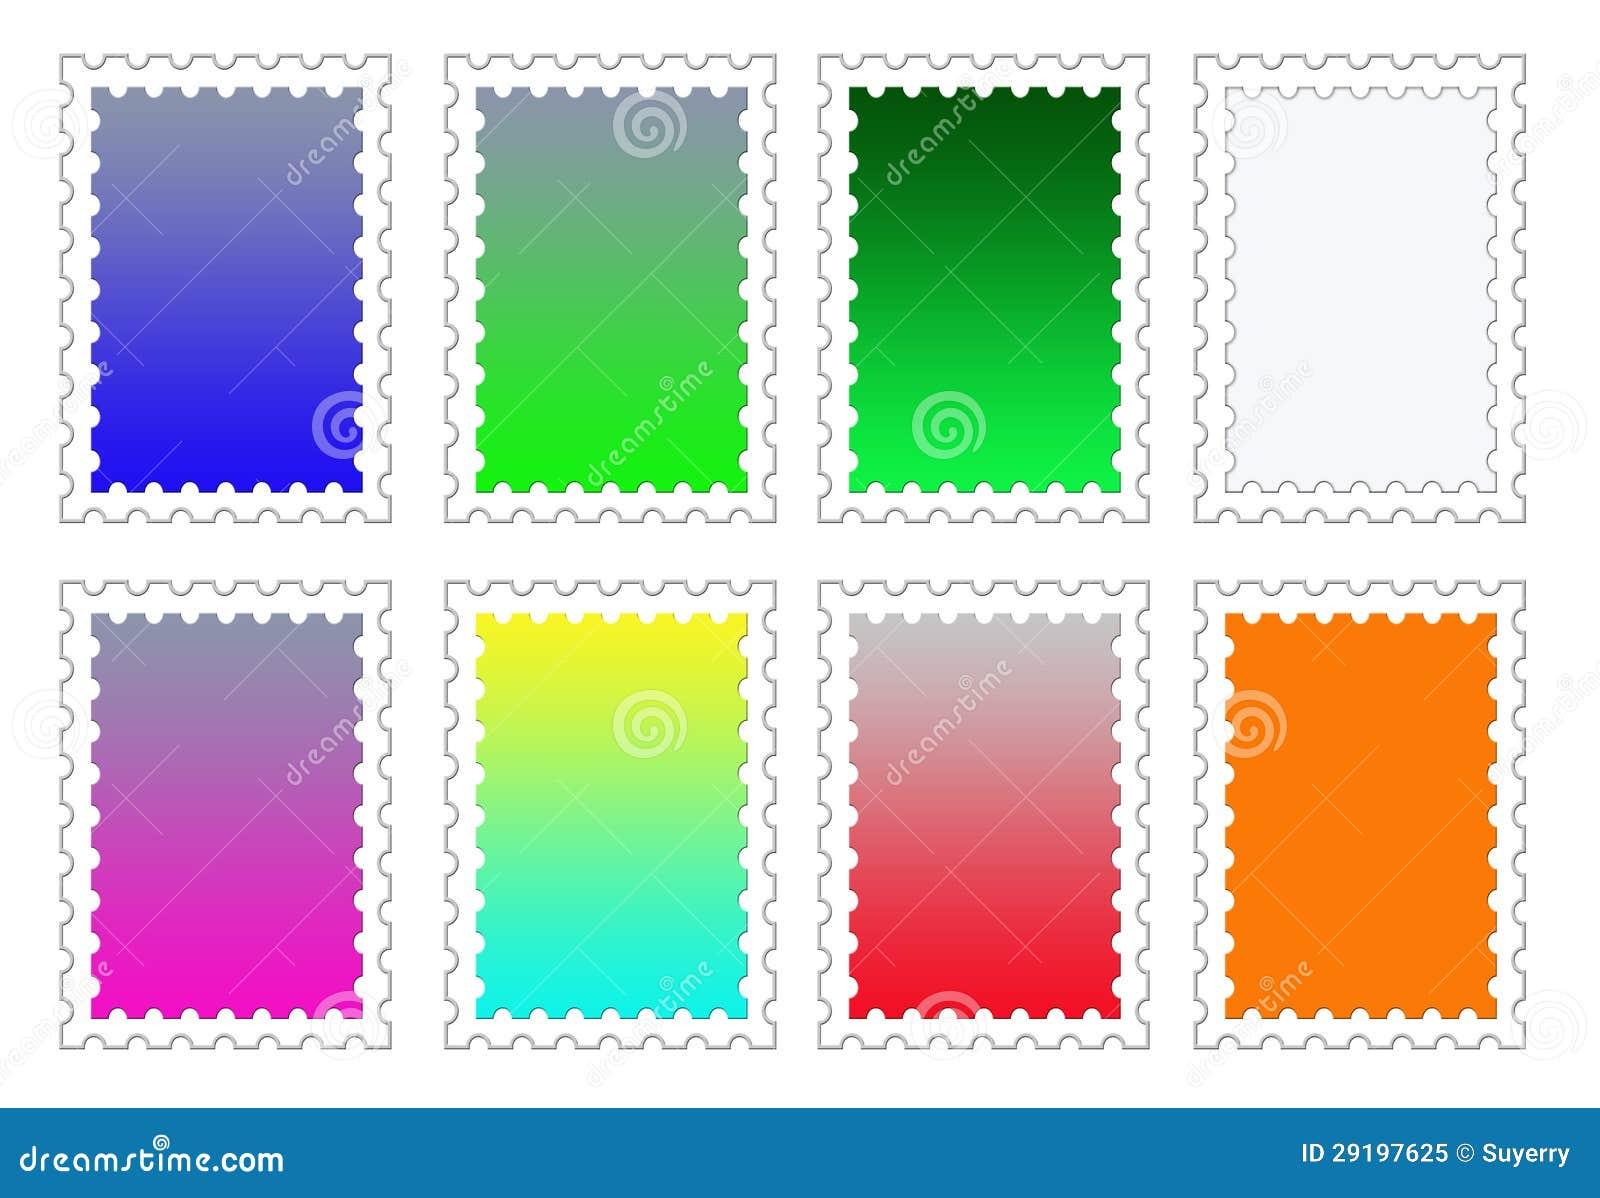 colorful stamp backgrounds set png stock illustration